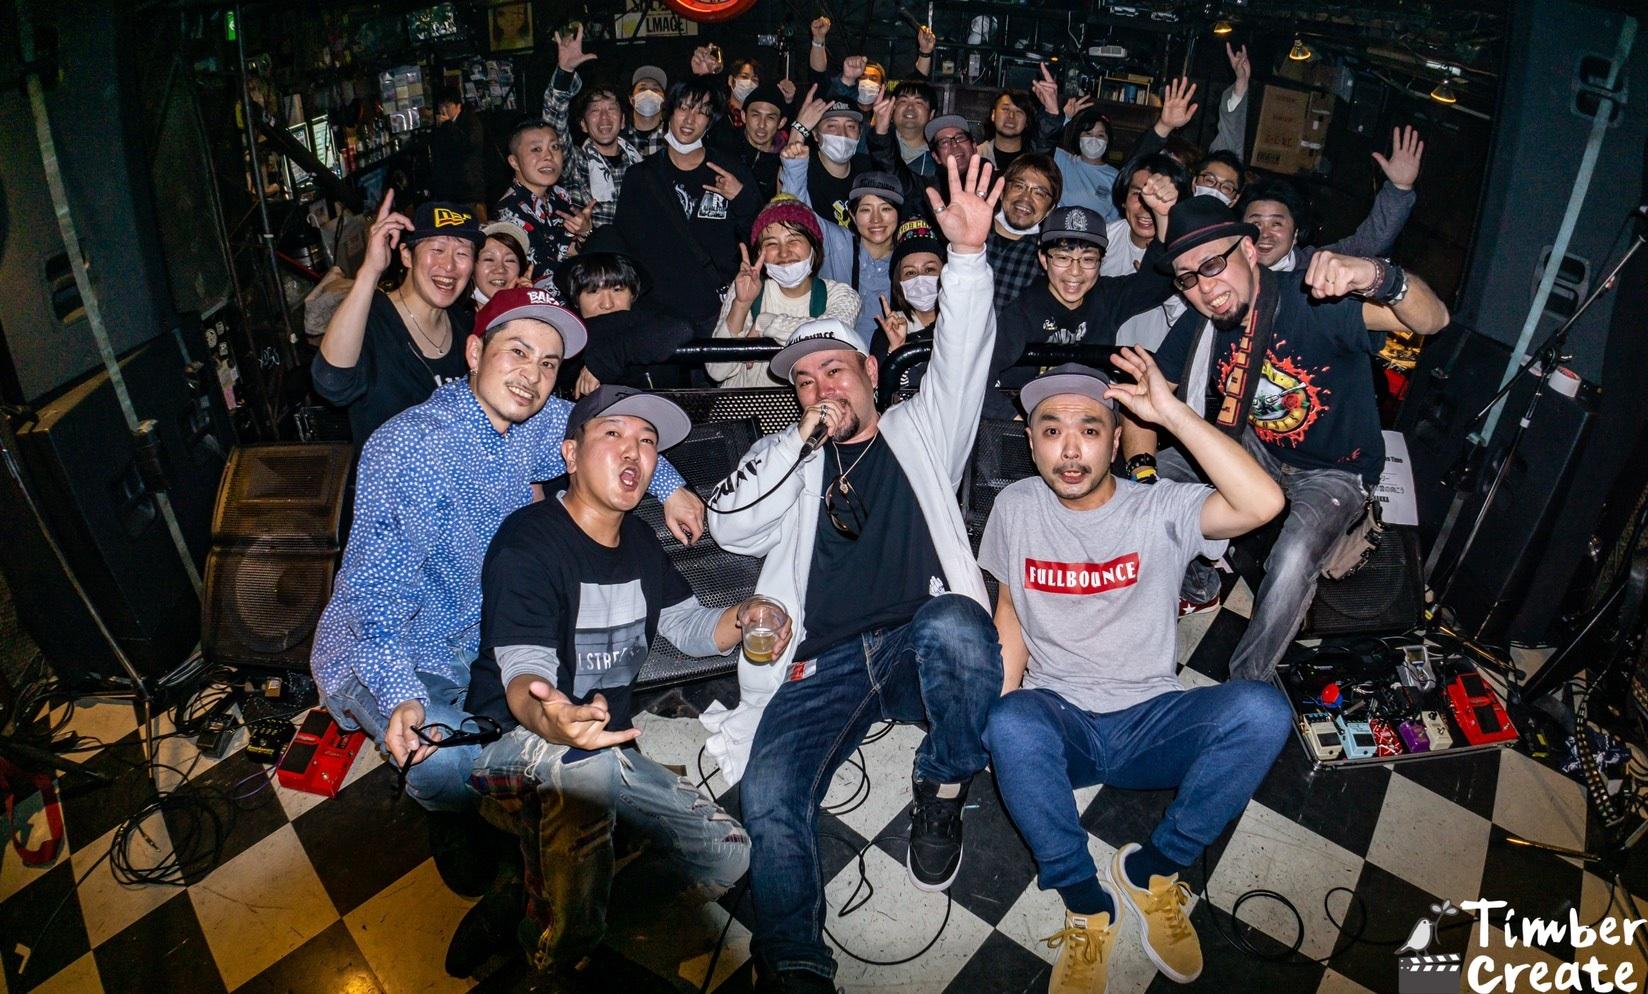 [Photo] 2020/03/08 [Hooky Records show] @下北沢SHELTER